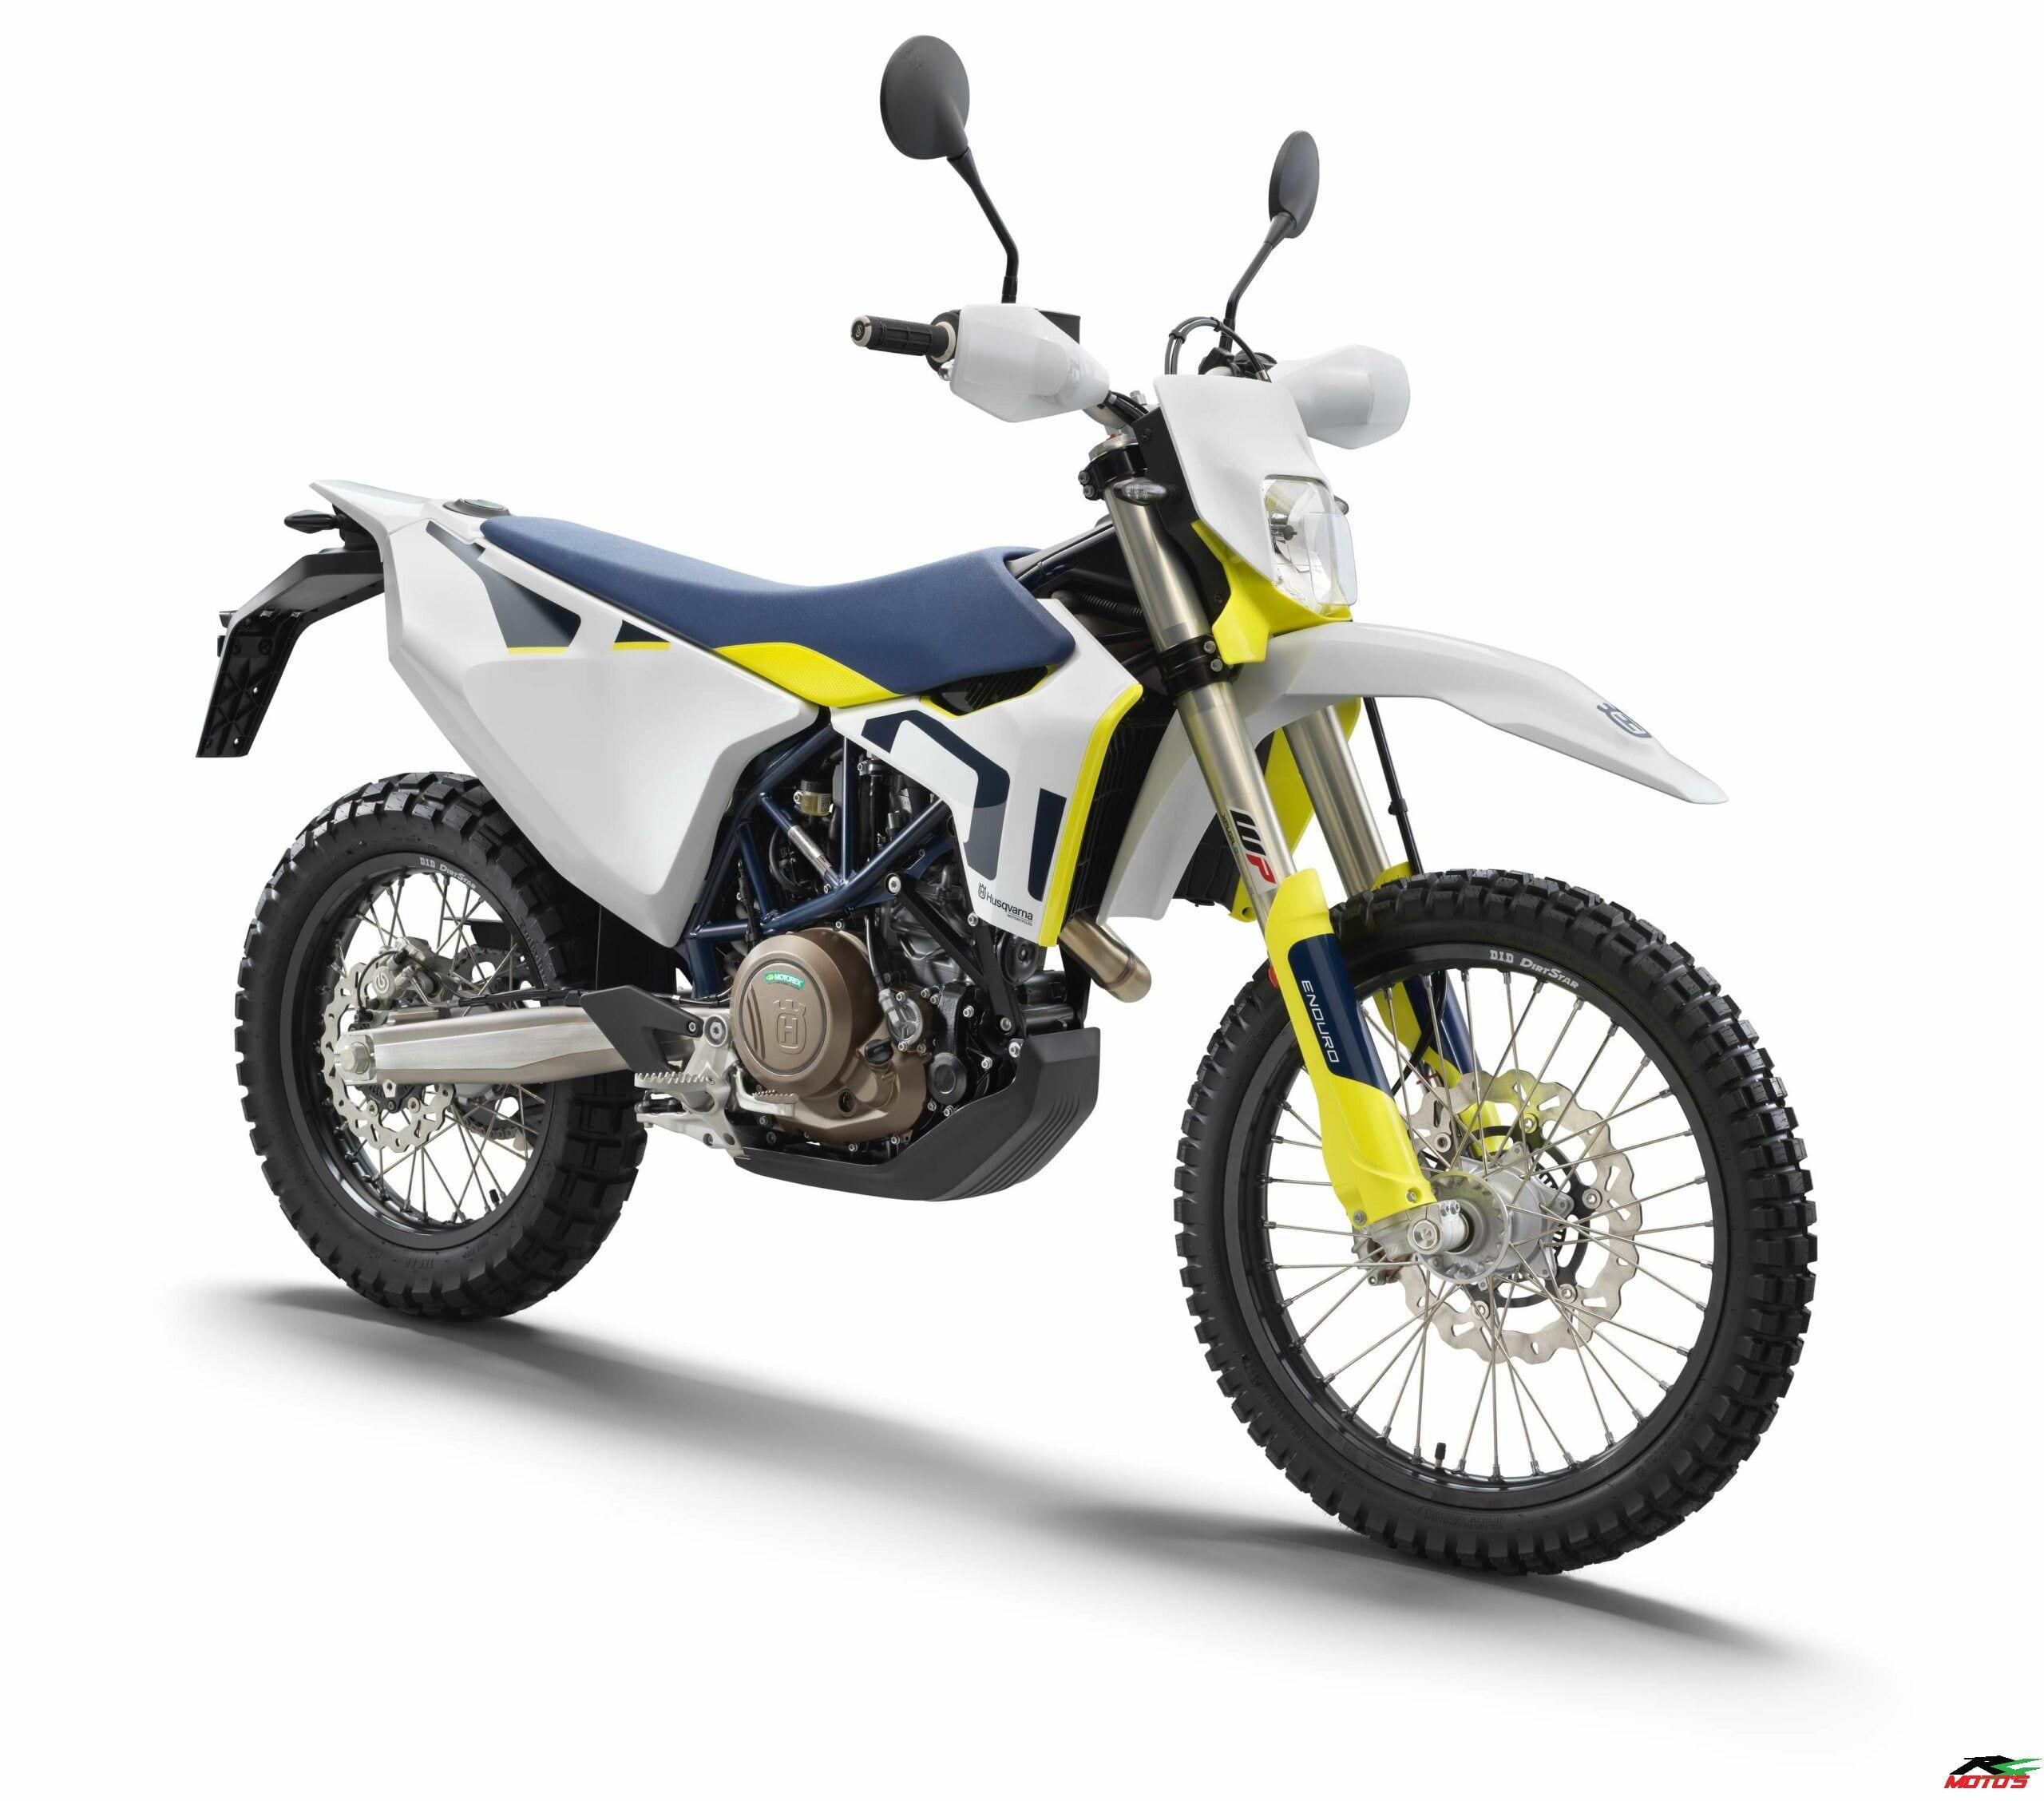 Husqvarna 701 Enduro 2021 - R4 Moto's